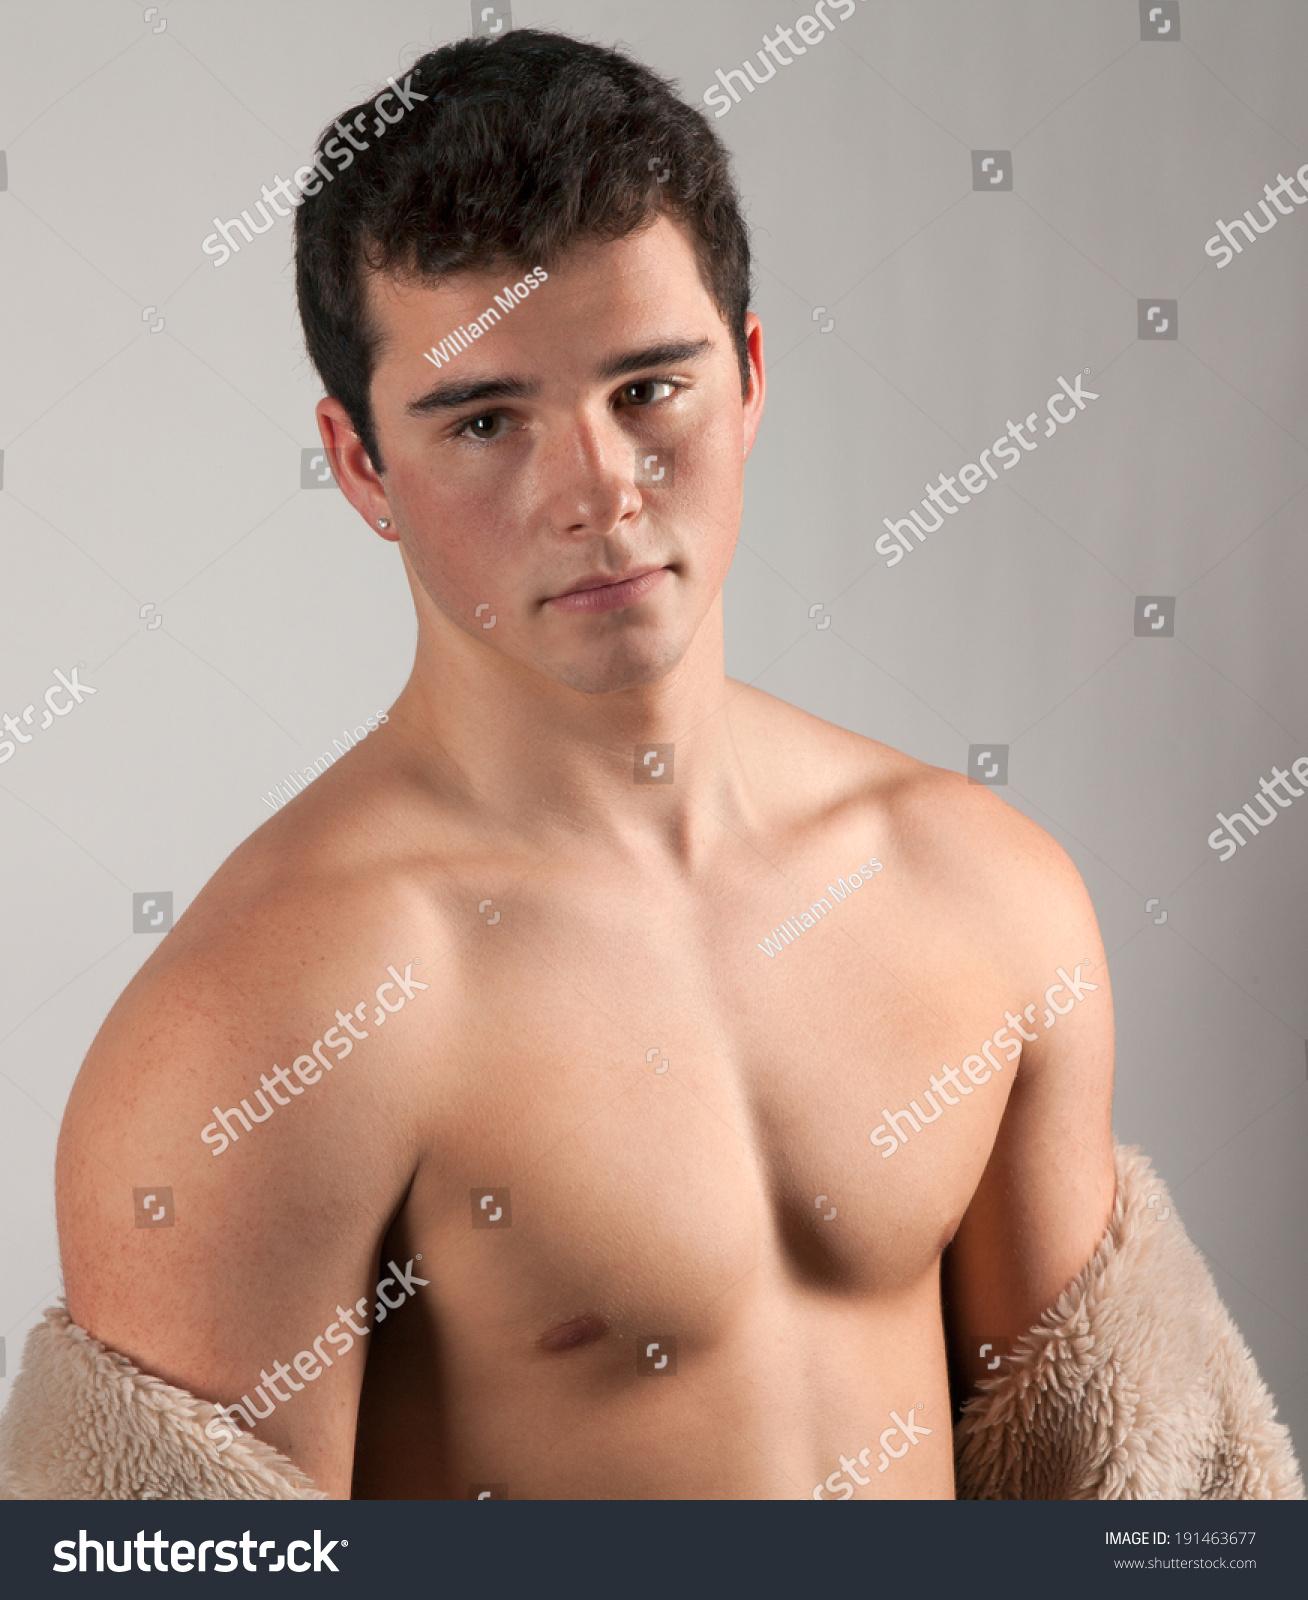 Teen Teenager Stock Photo 20